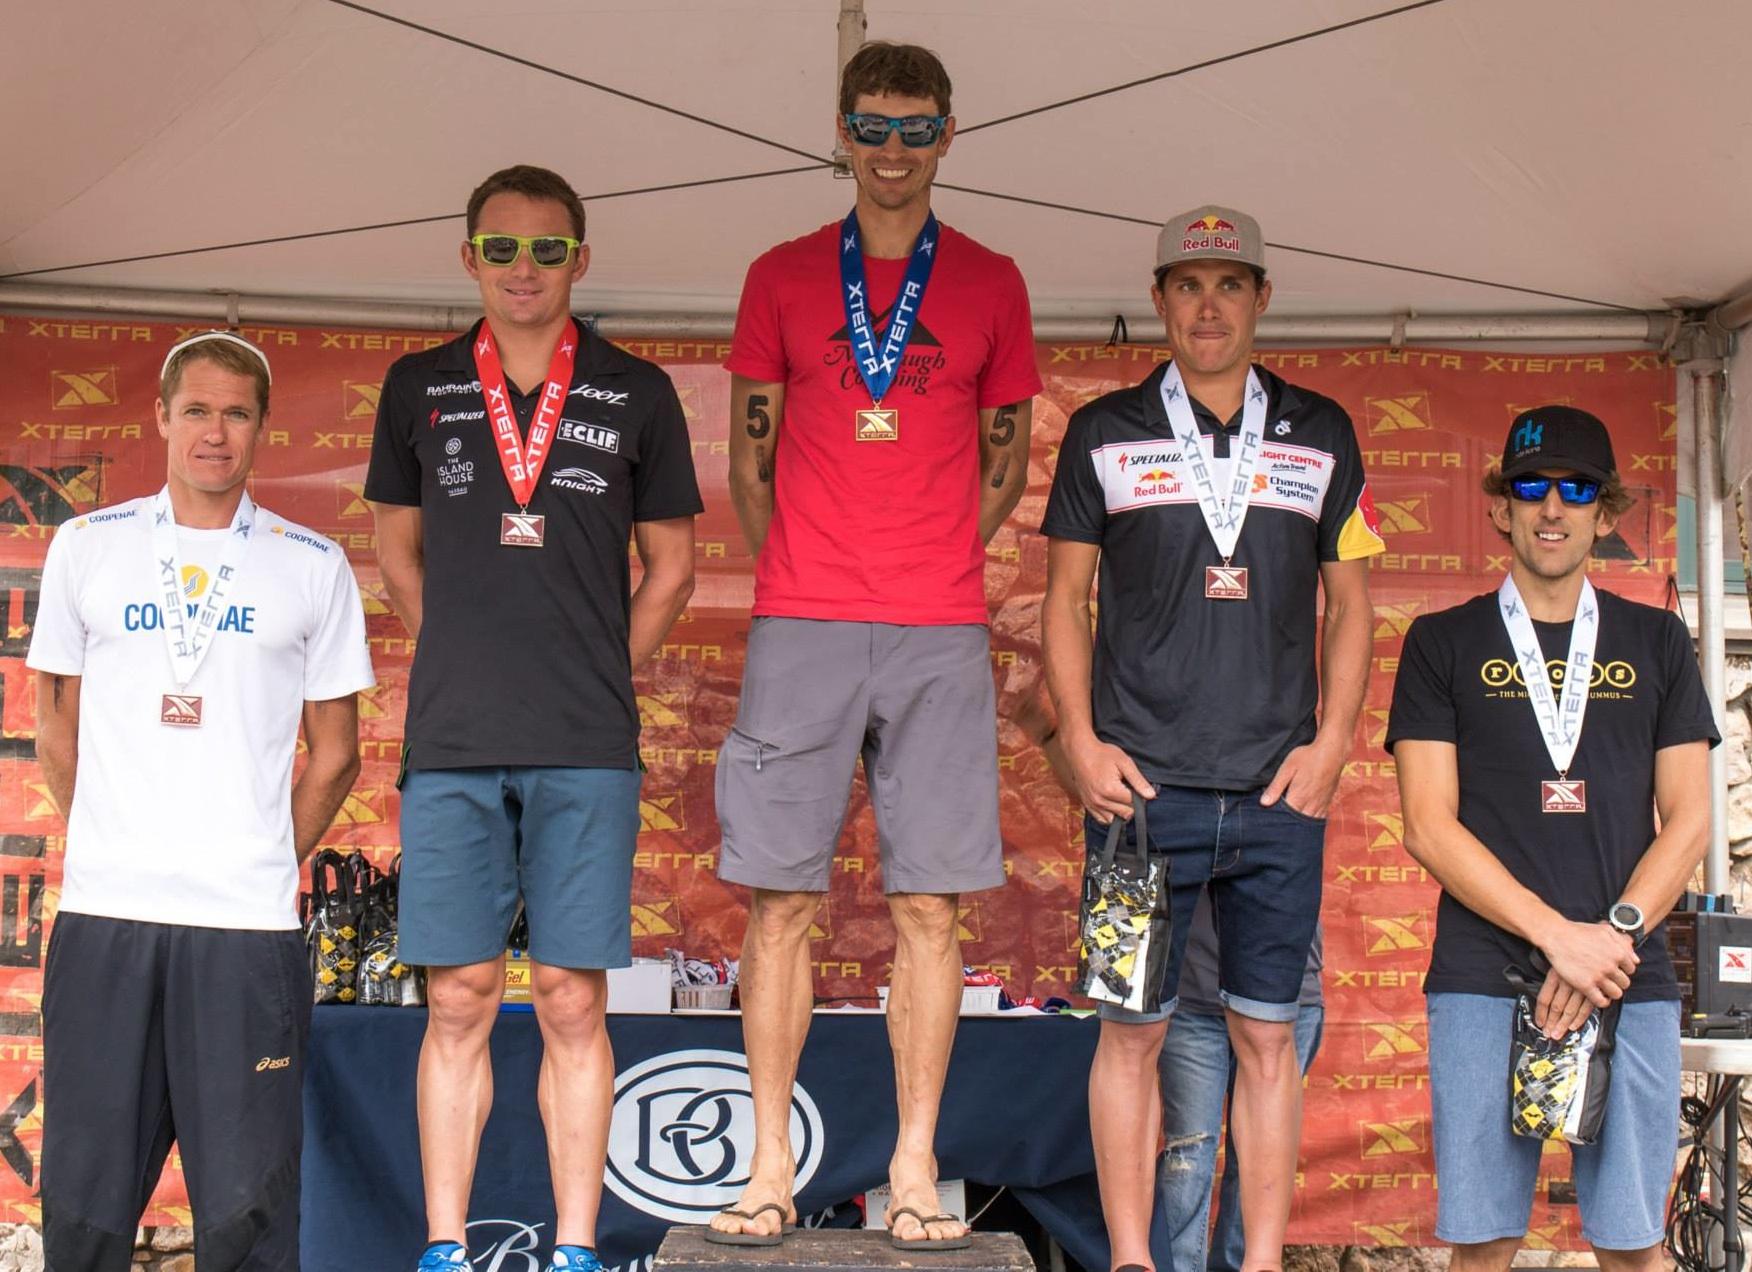 Xterra Race Beaver Creek Mens Pro Podium